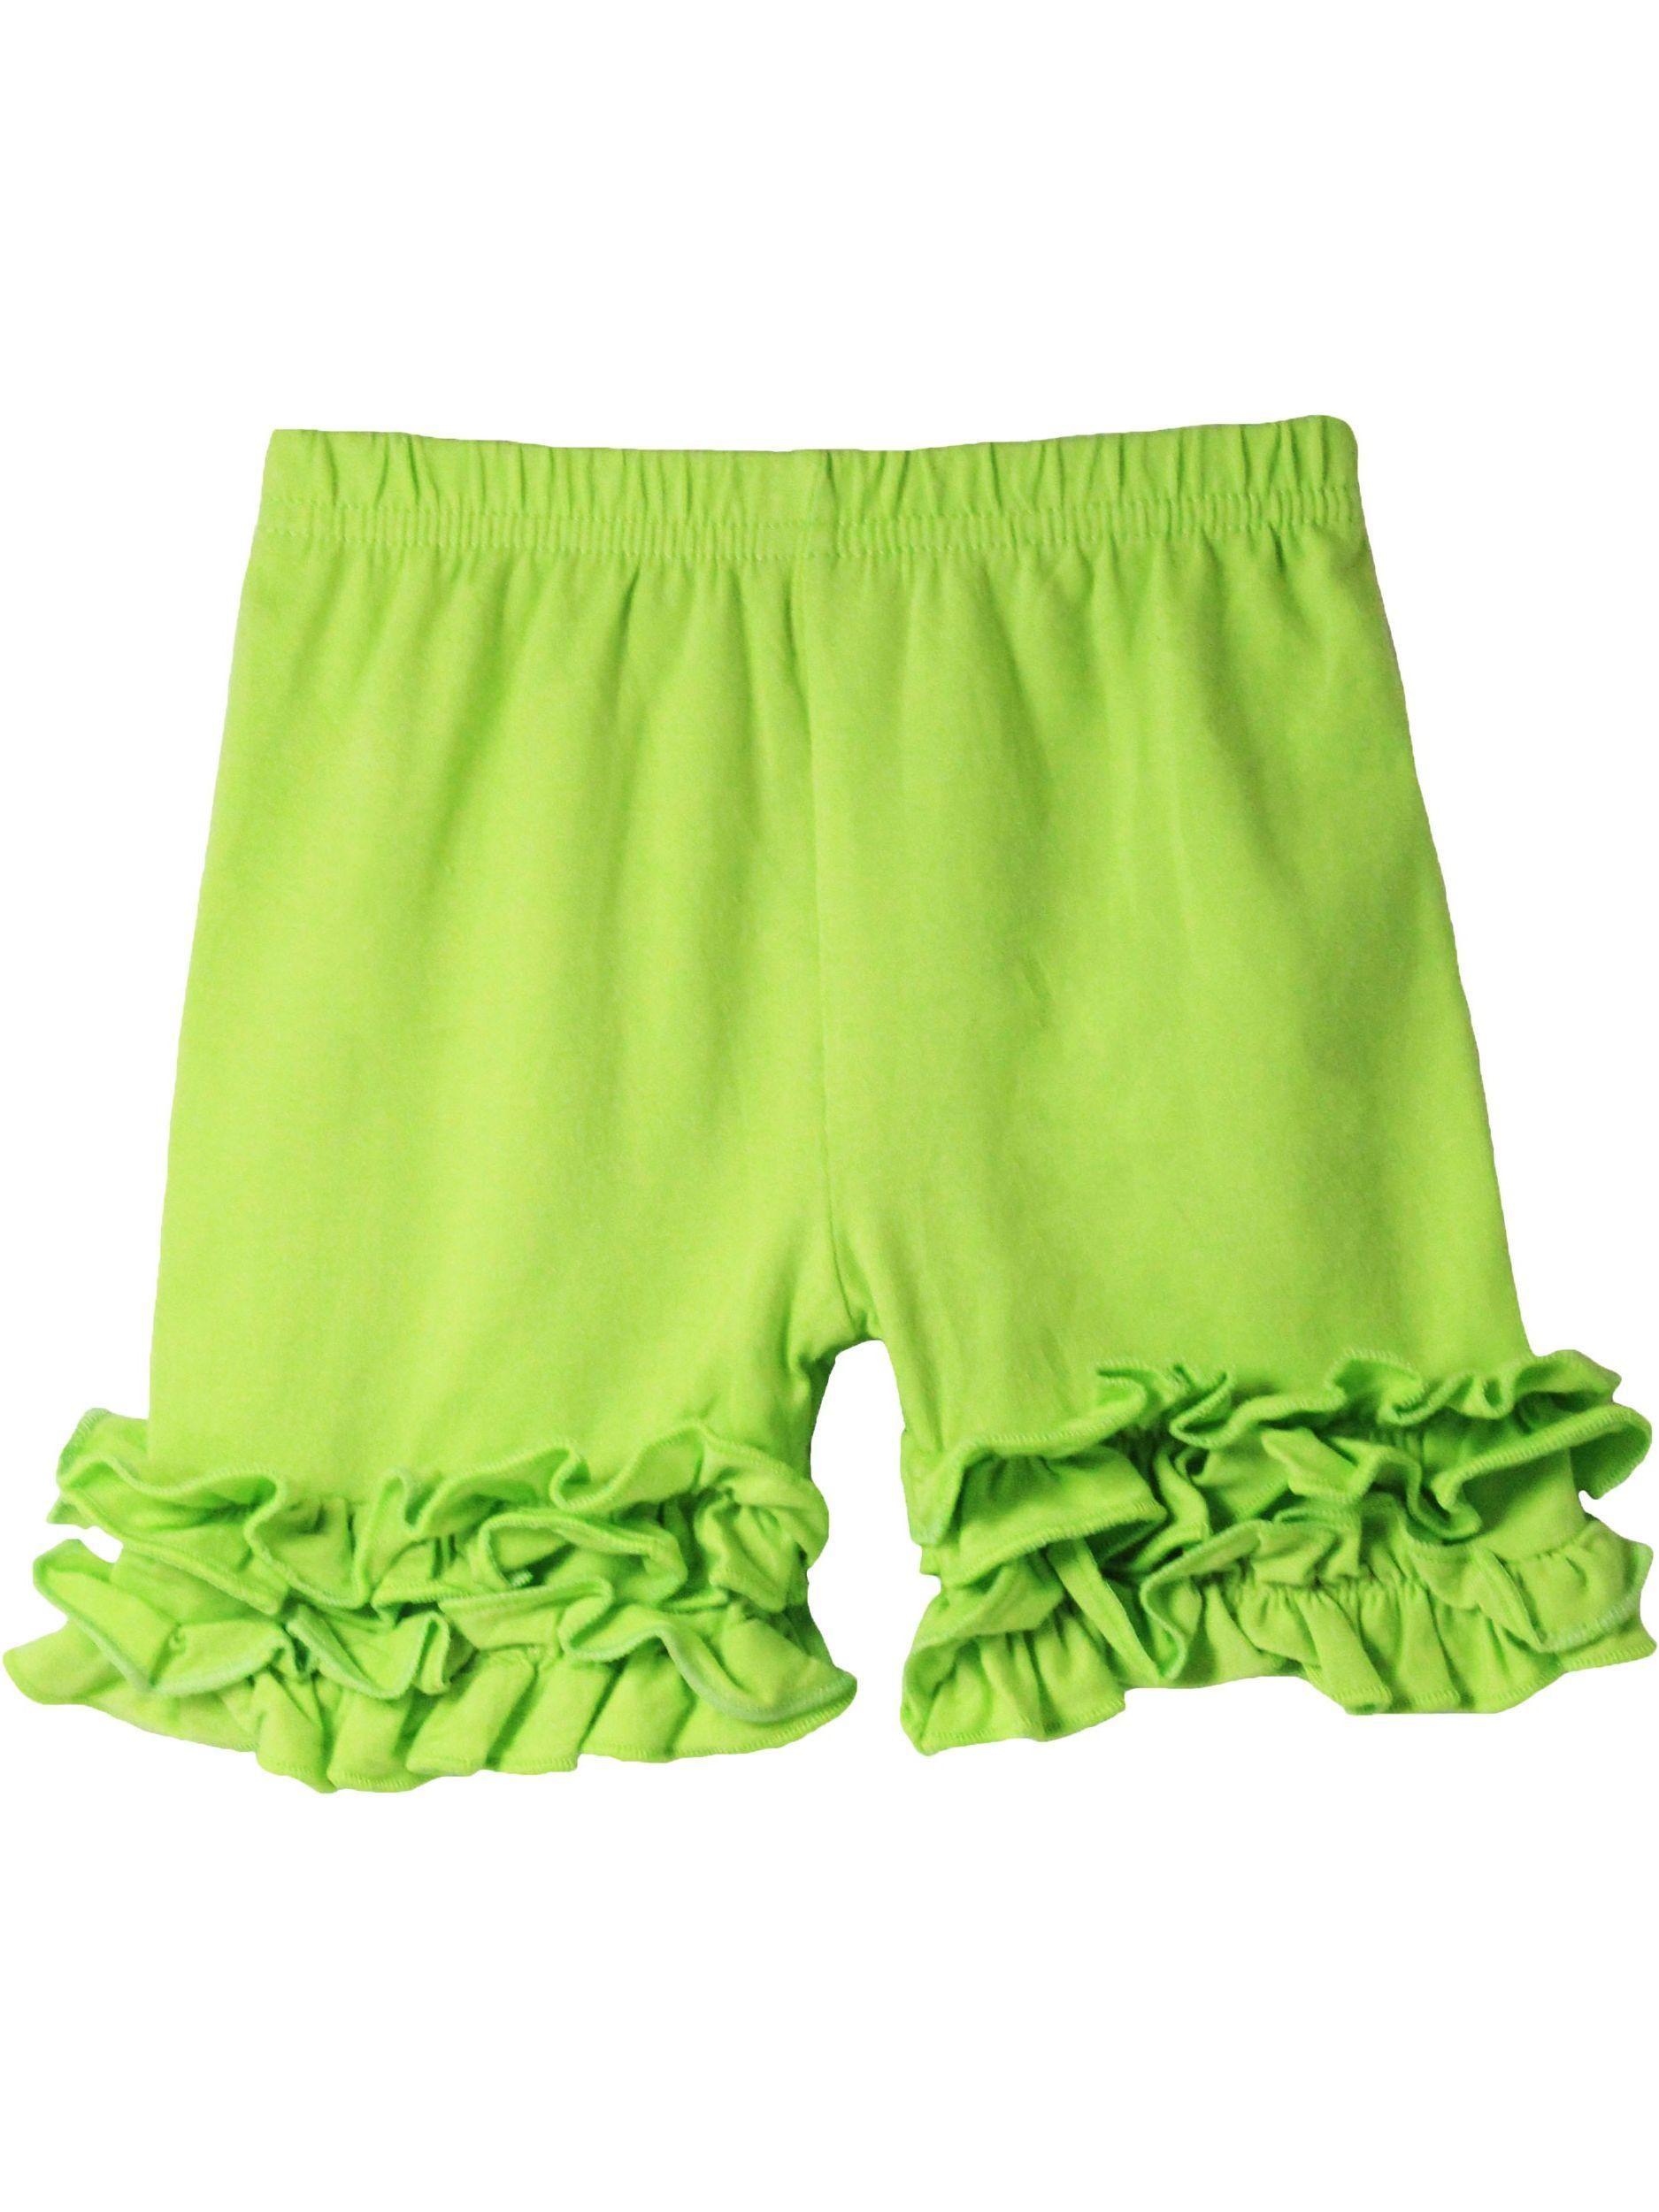 Girls Lime Green Elastic Waist Ruffle Bottom Icing Boutique Shorts